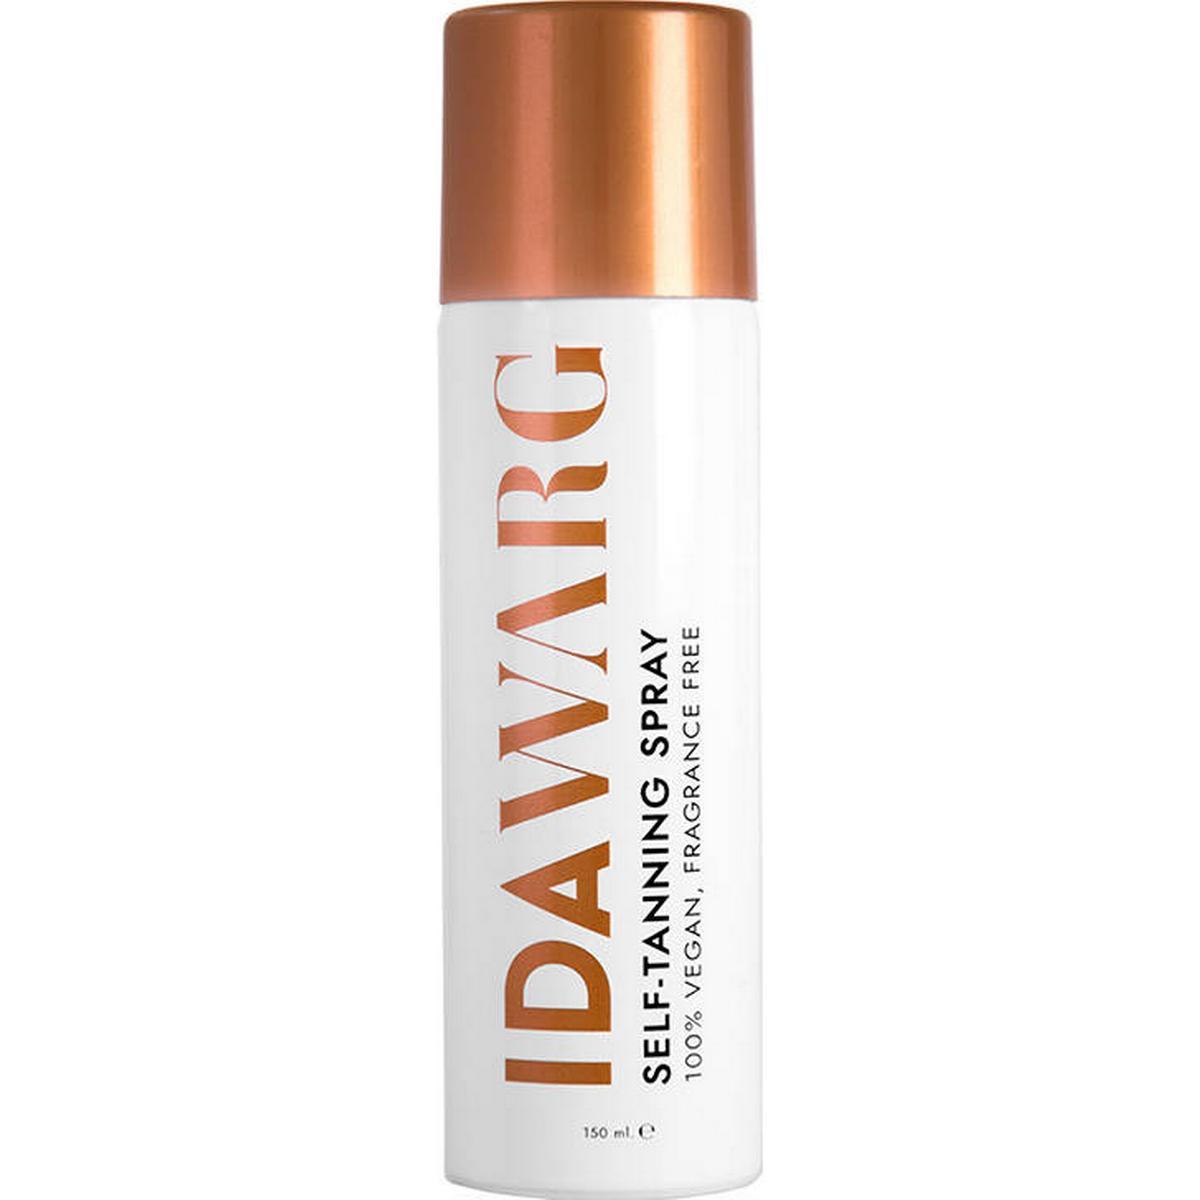 biotherm selvbruner spray